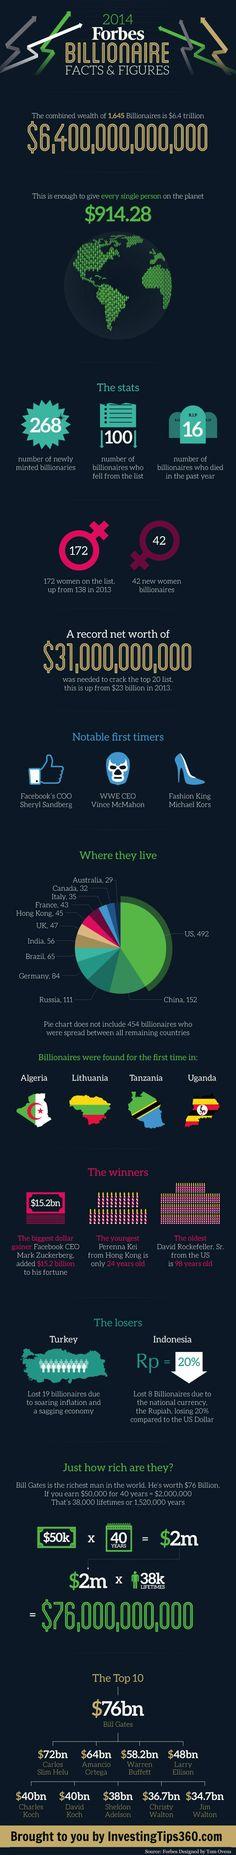 2014 Forbes Billionaire Facts & Figures [Infographic]  #billionaire #gamechangers